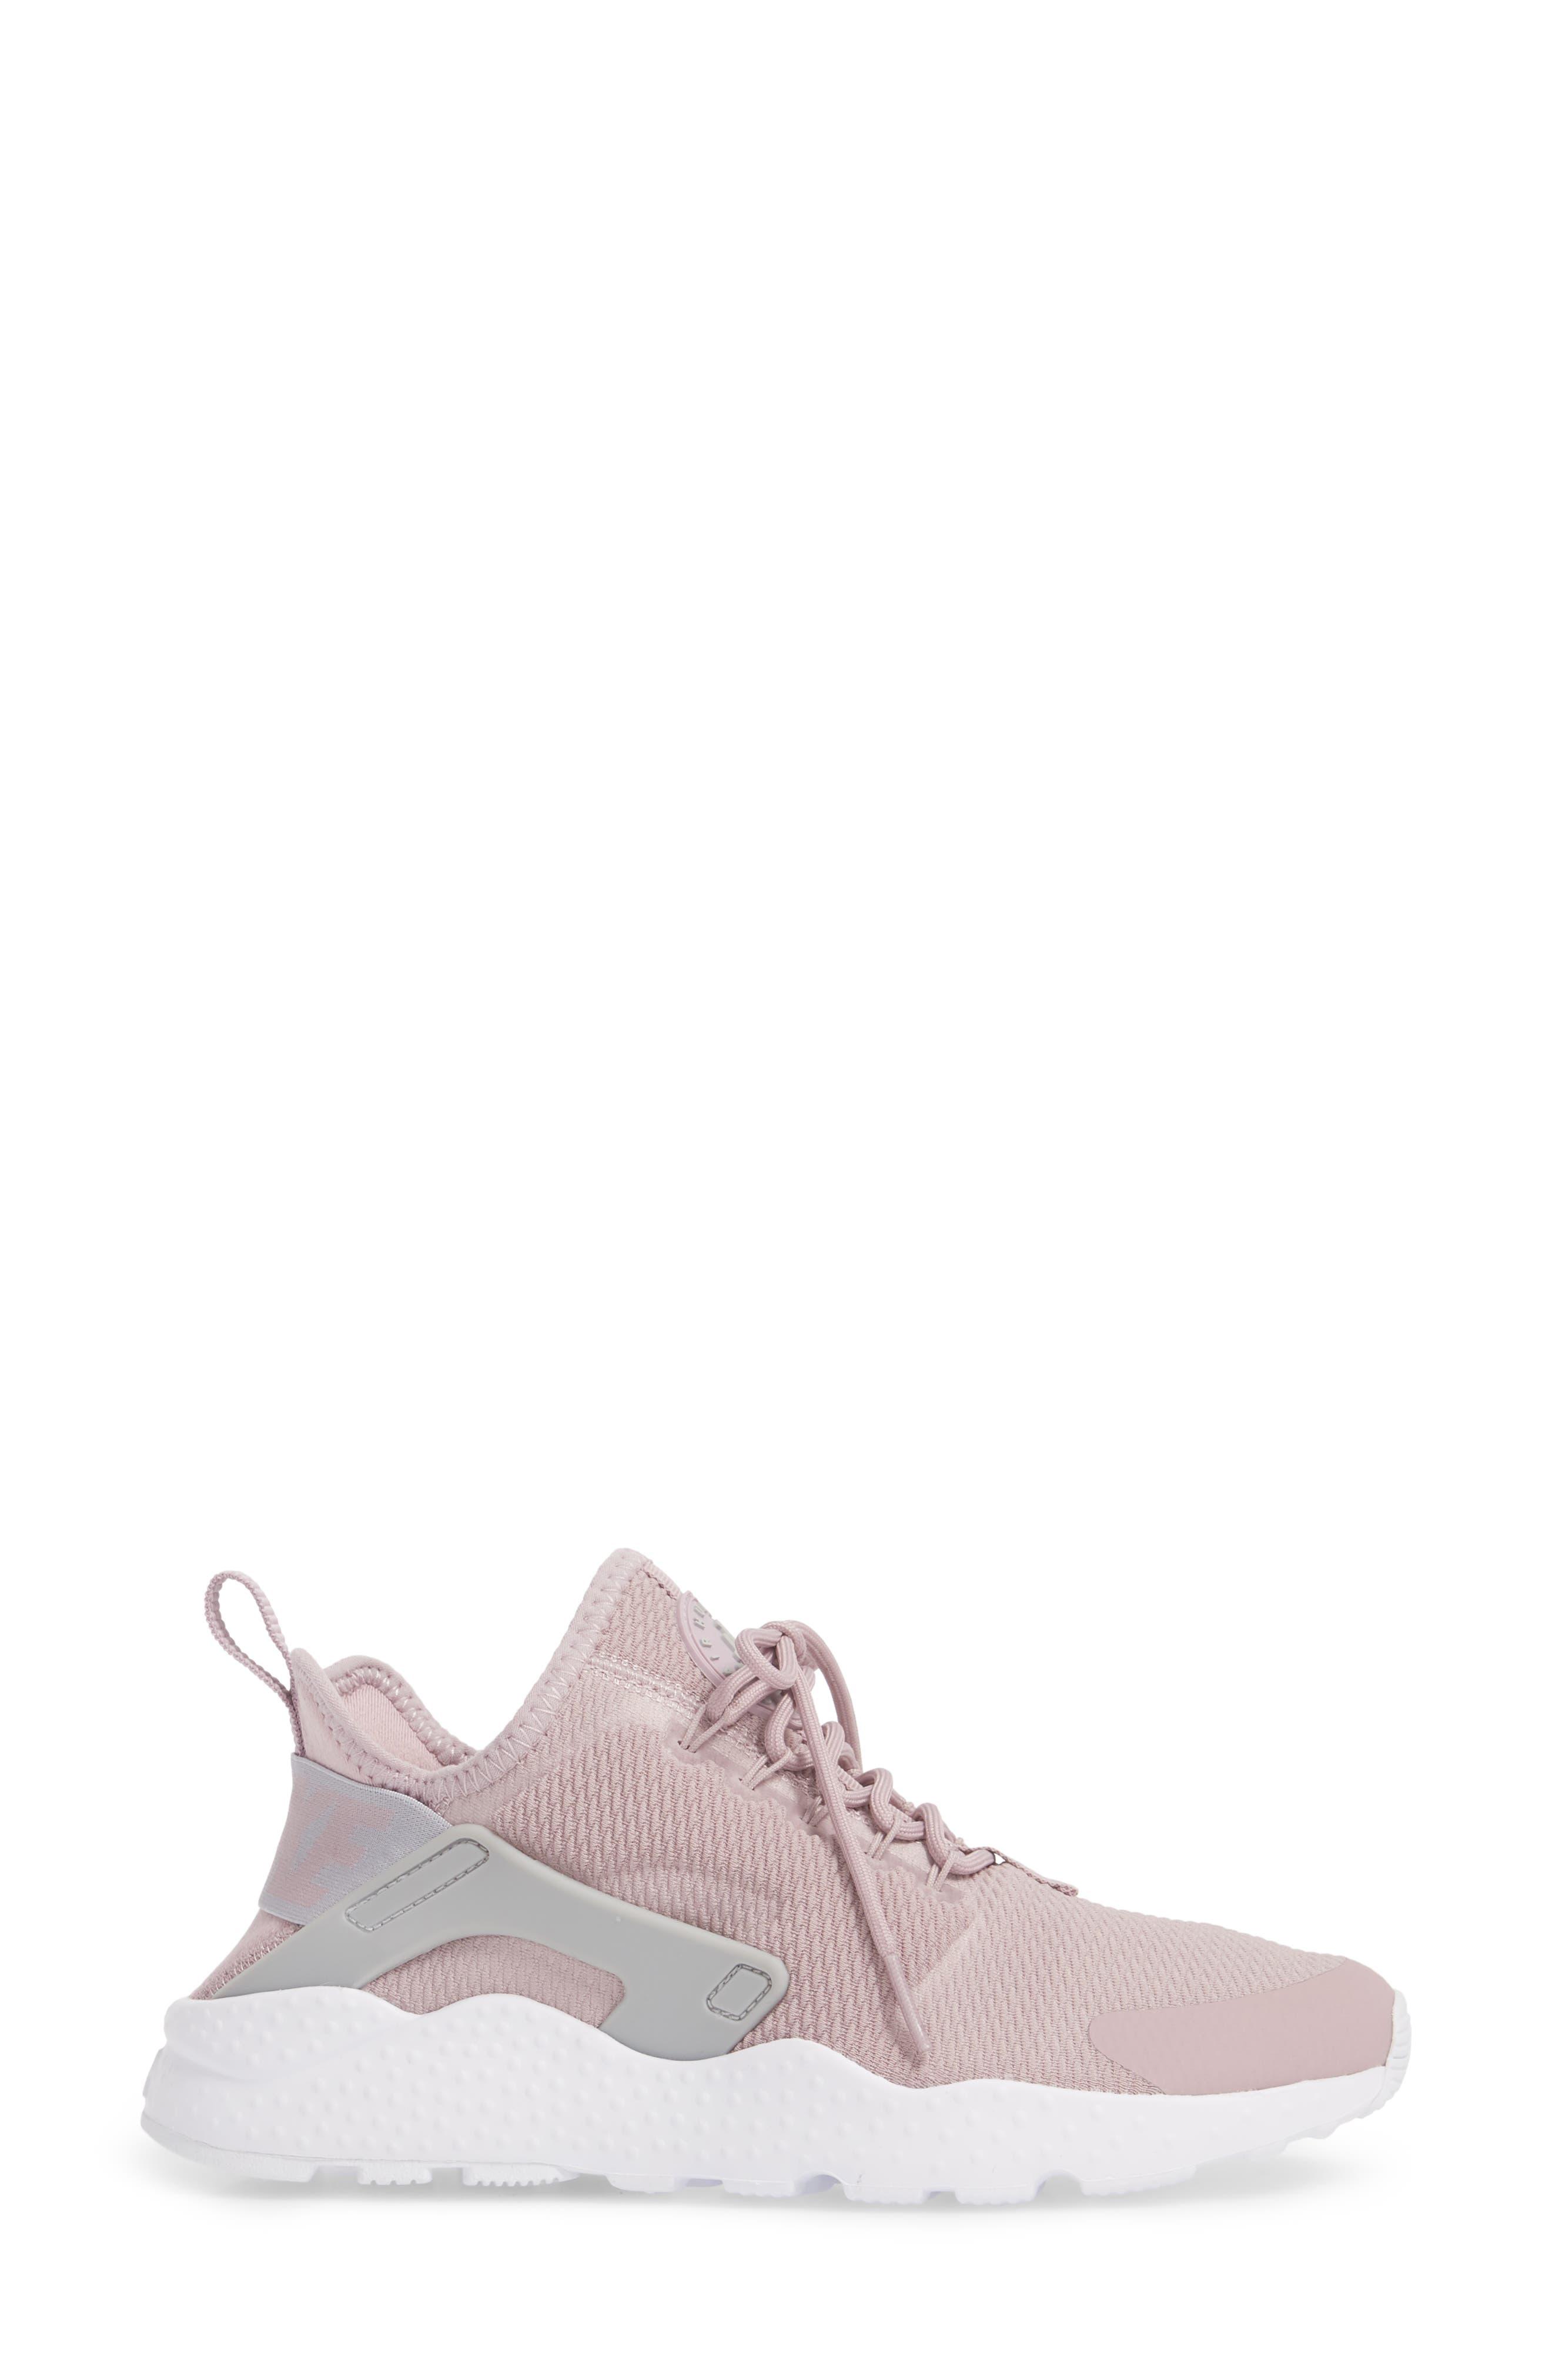 Air Huarache Sneaker,                             Alternate thumbnail 3, color,                             Elemental Rose/ Wolf Grey